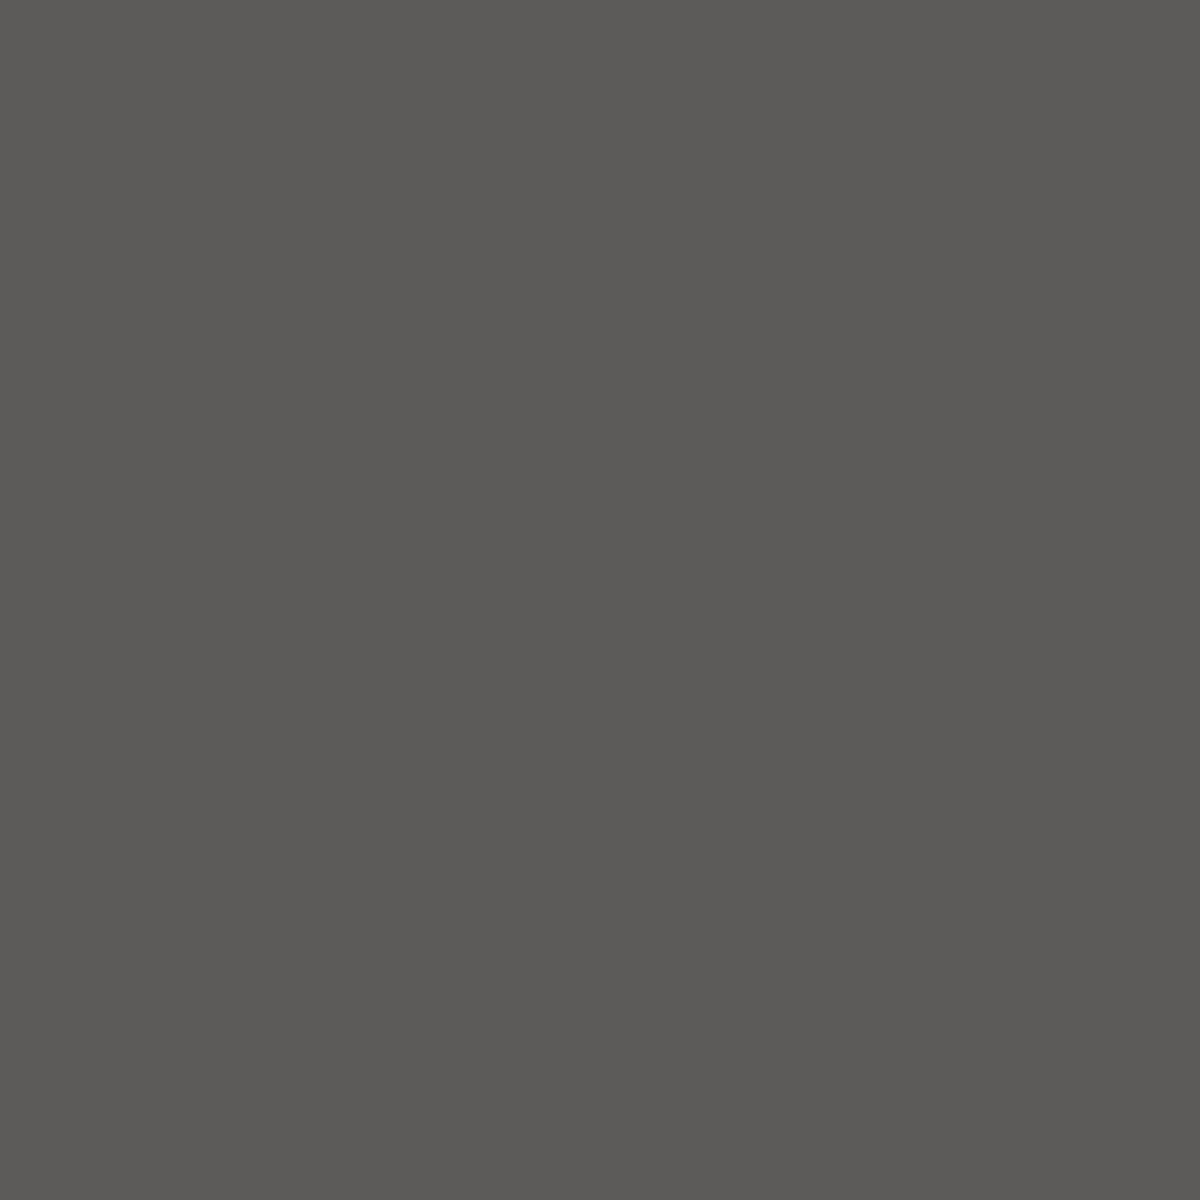 ORGANIC LINE (5ml)  - PIGMENT GRAPHITE ORGANICLINE AMIEA (5 ml)